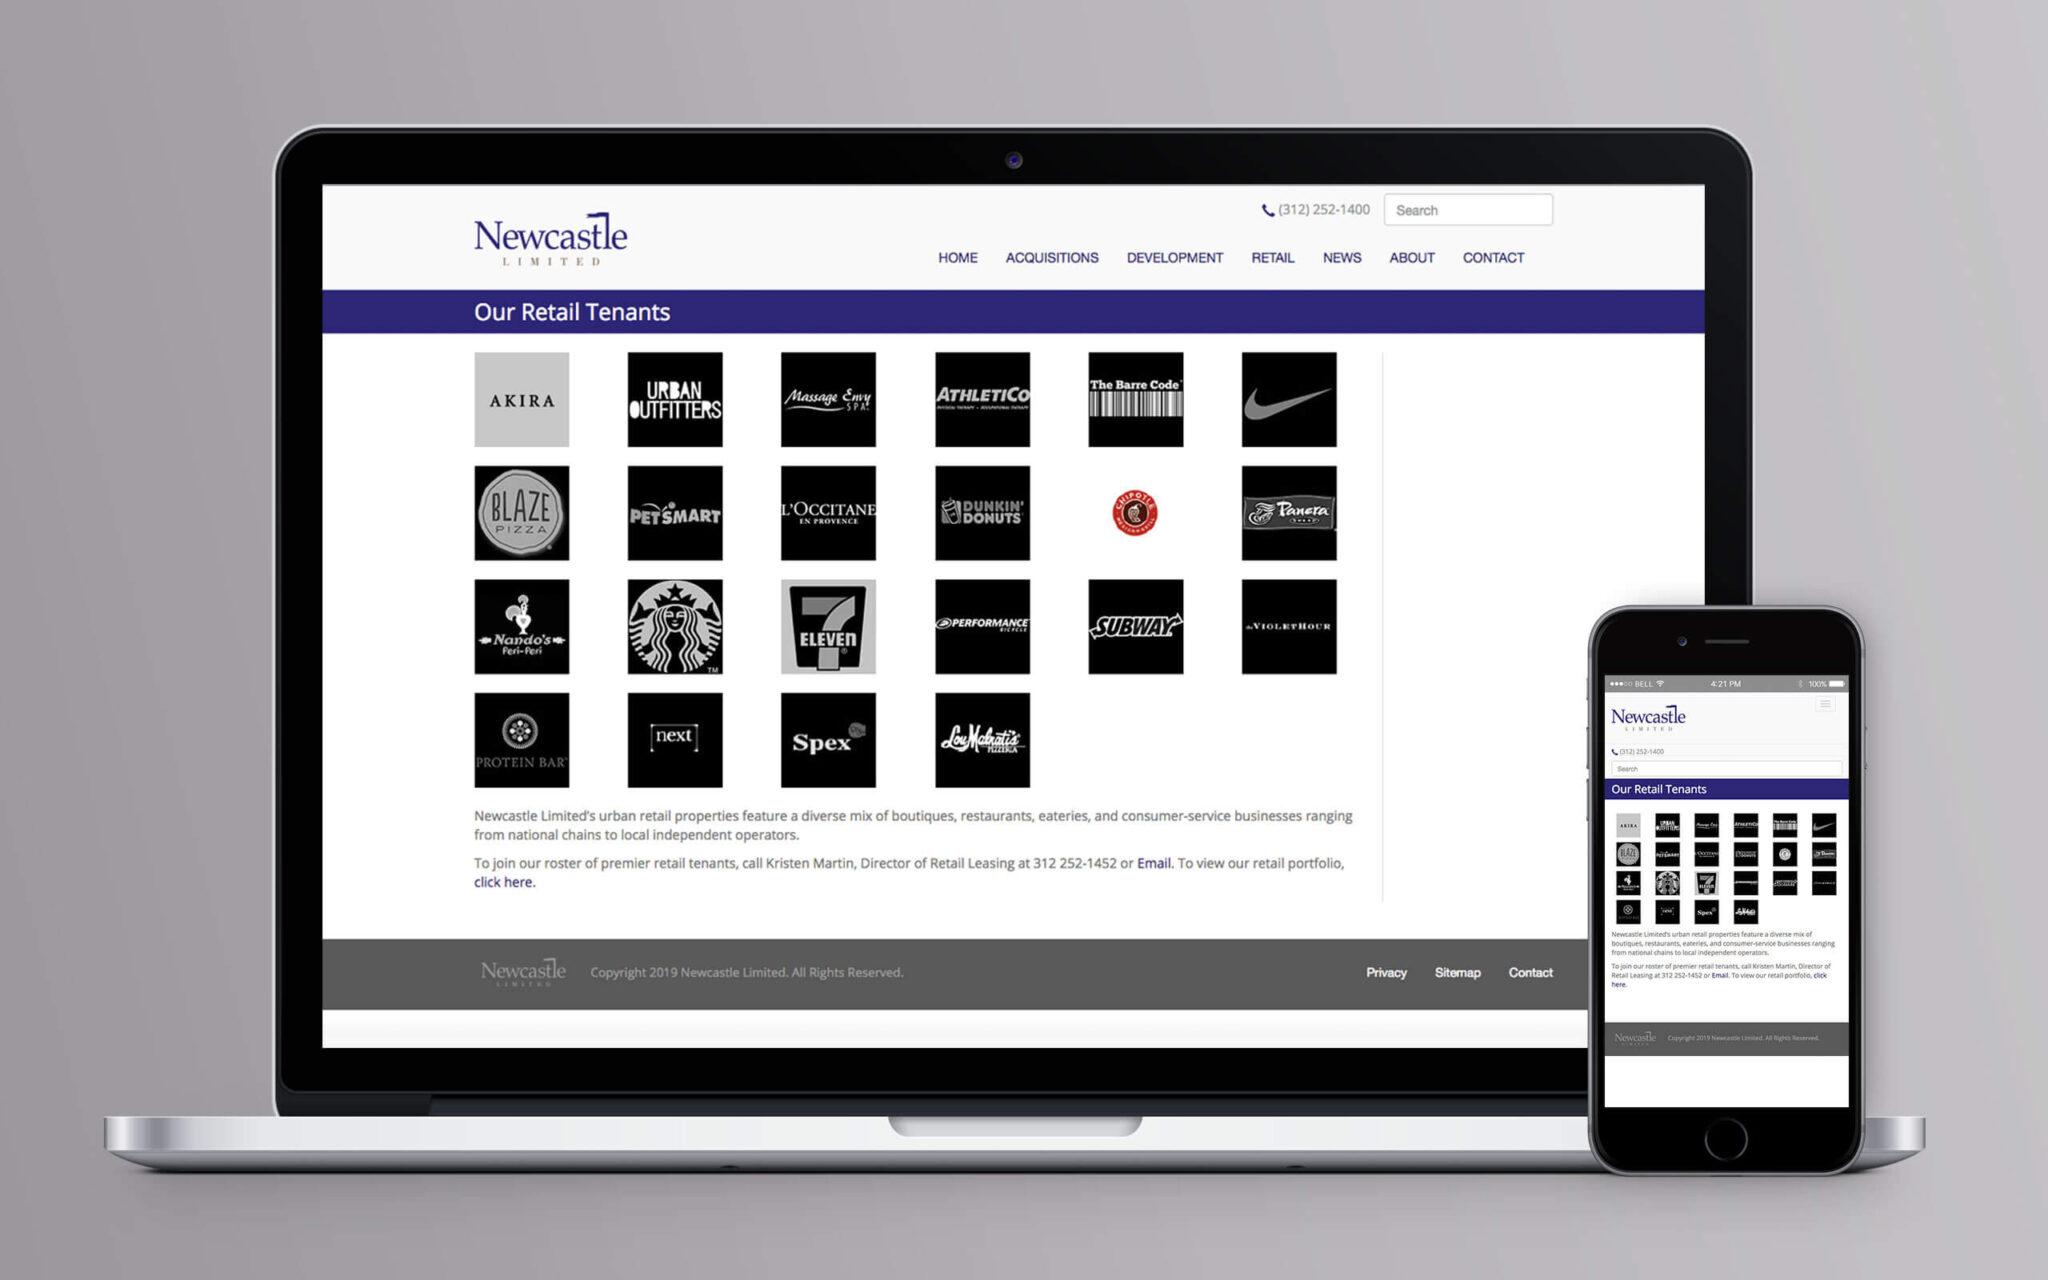 Newcastle Limited Website Retail Tenants